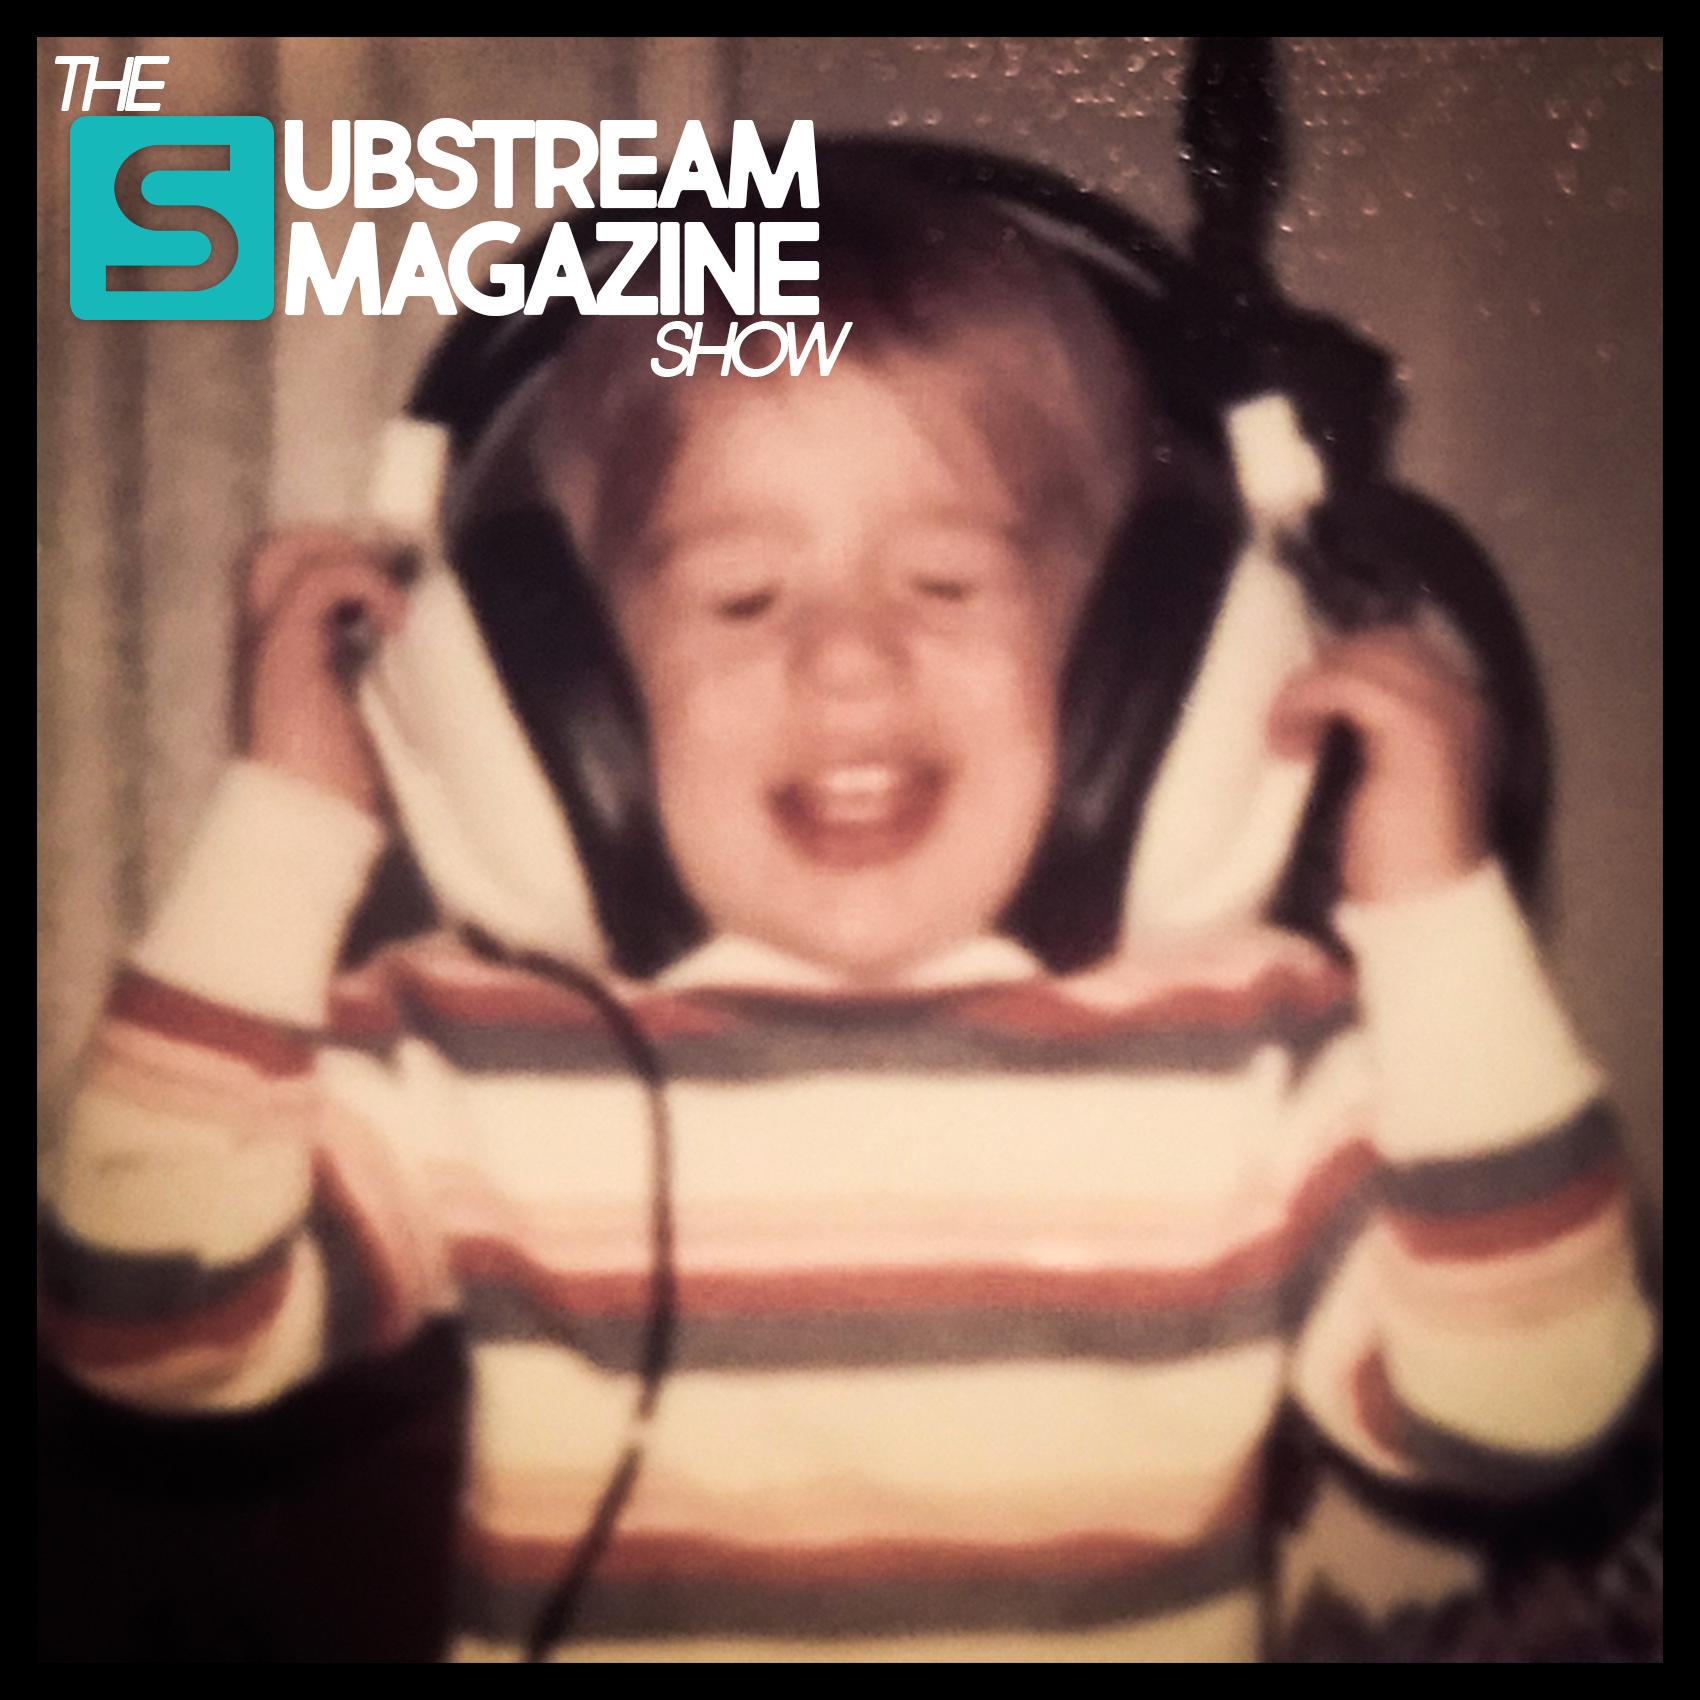 The Substream Magazine Show launches today via idobi Radio